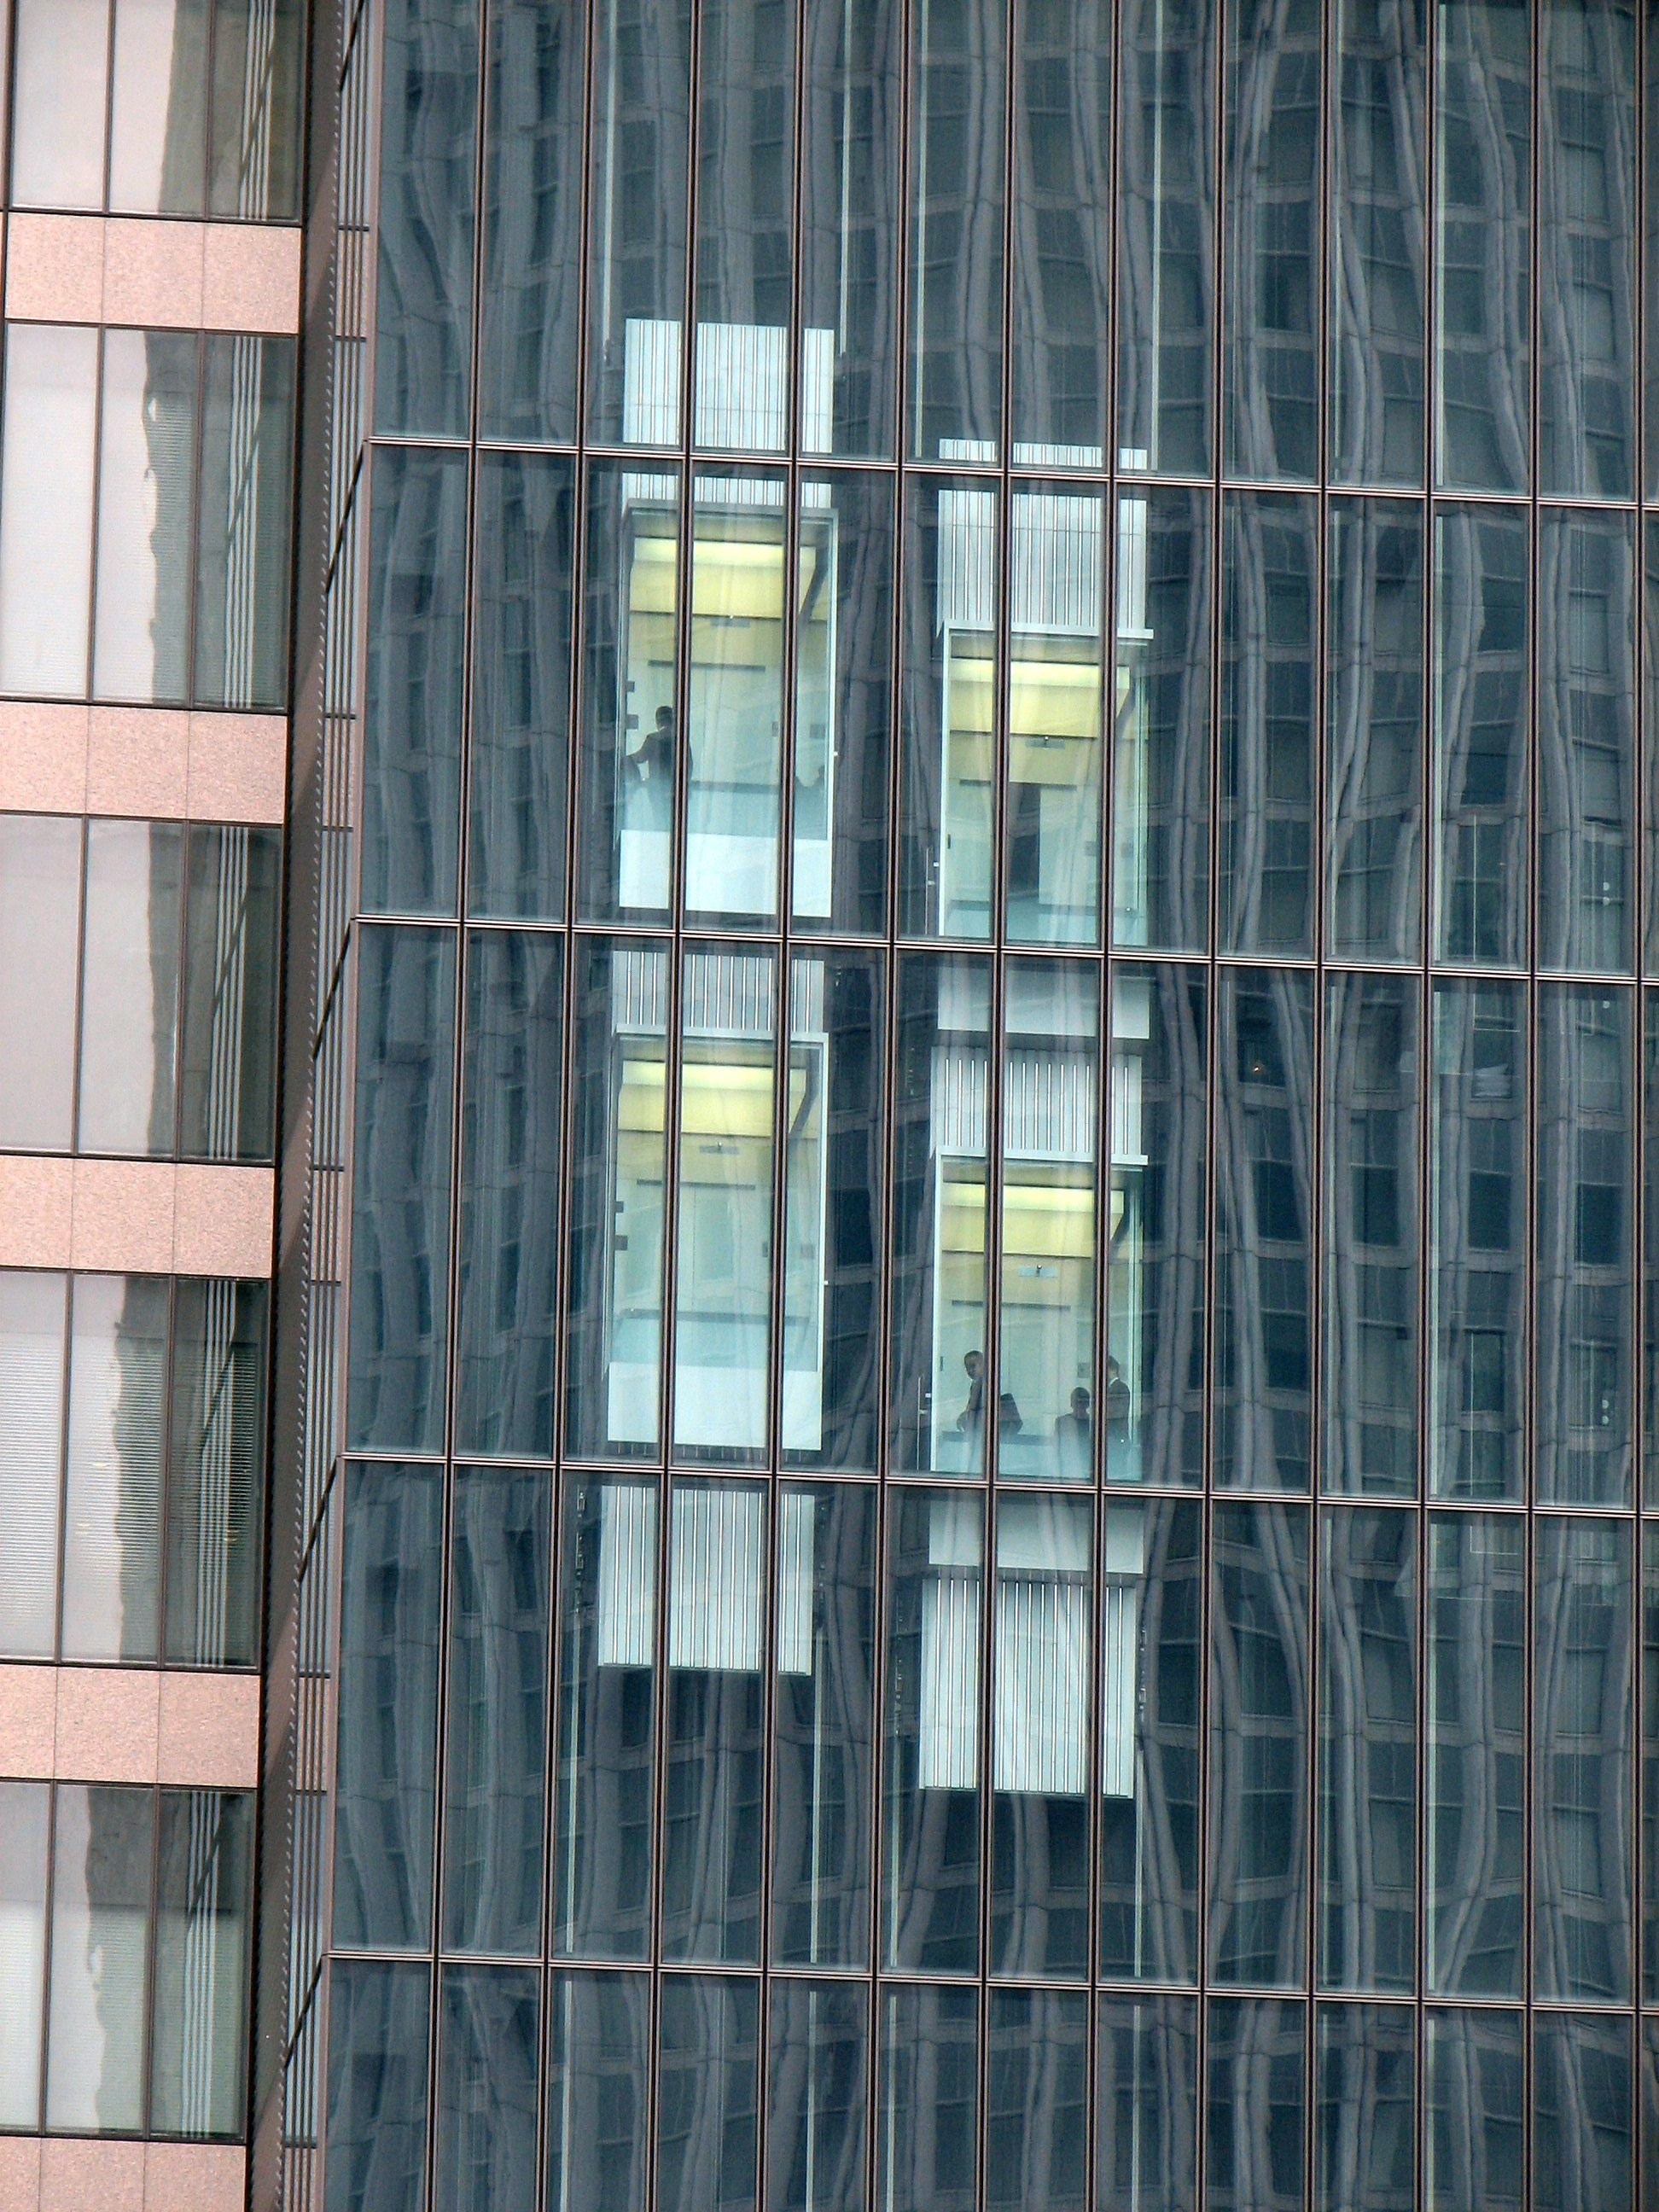 Double-deck elevators at Midland Square, Nagoya, Japan